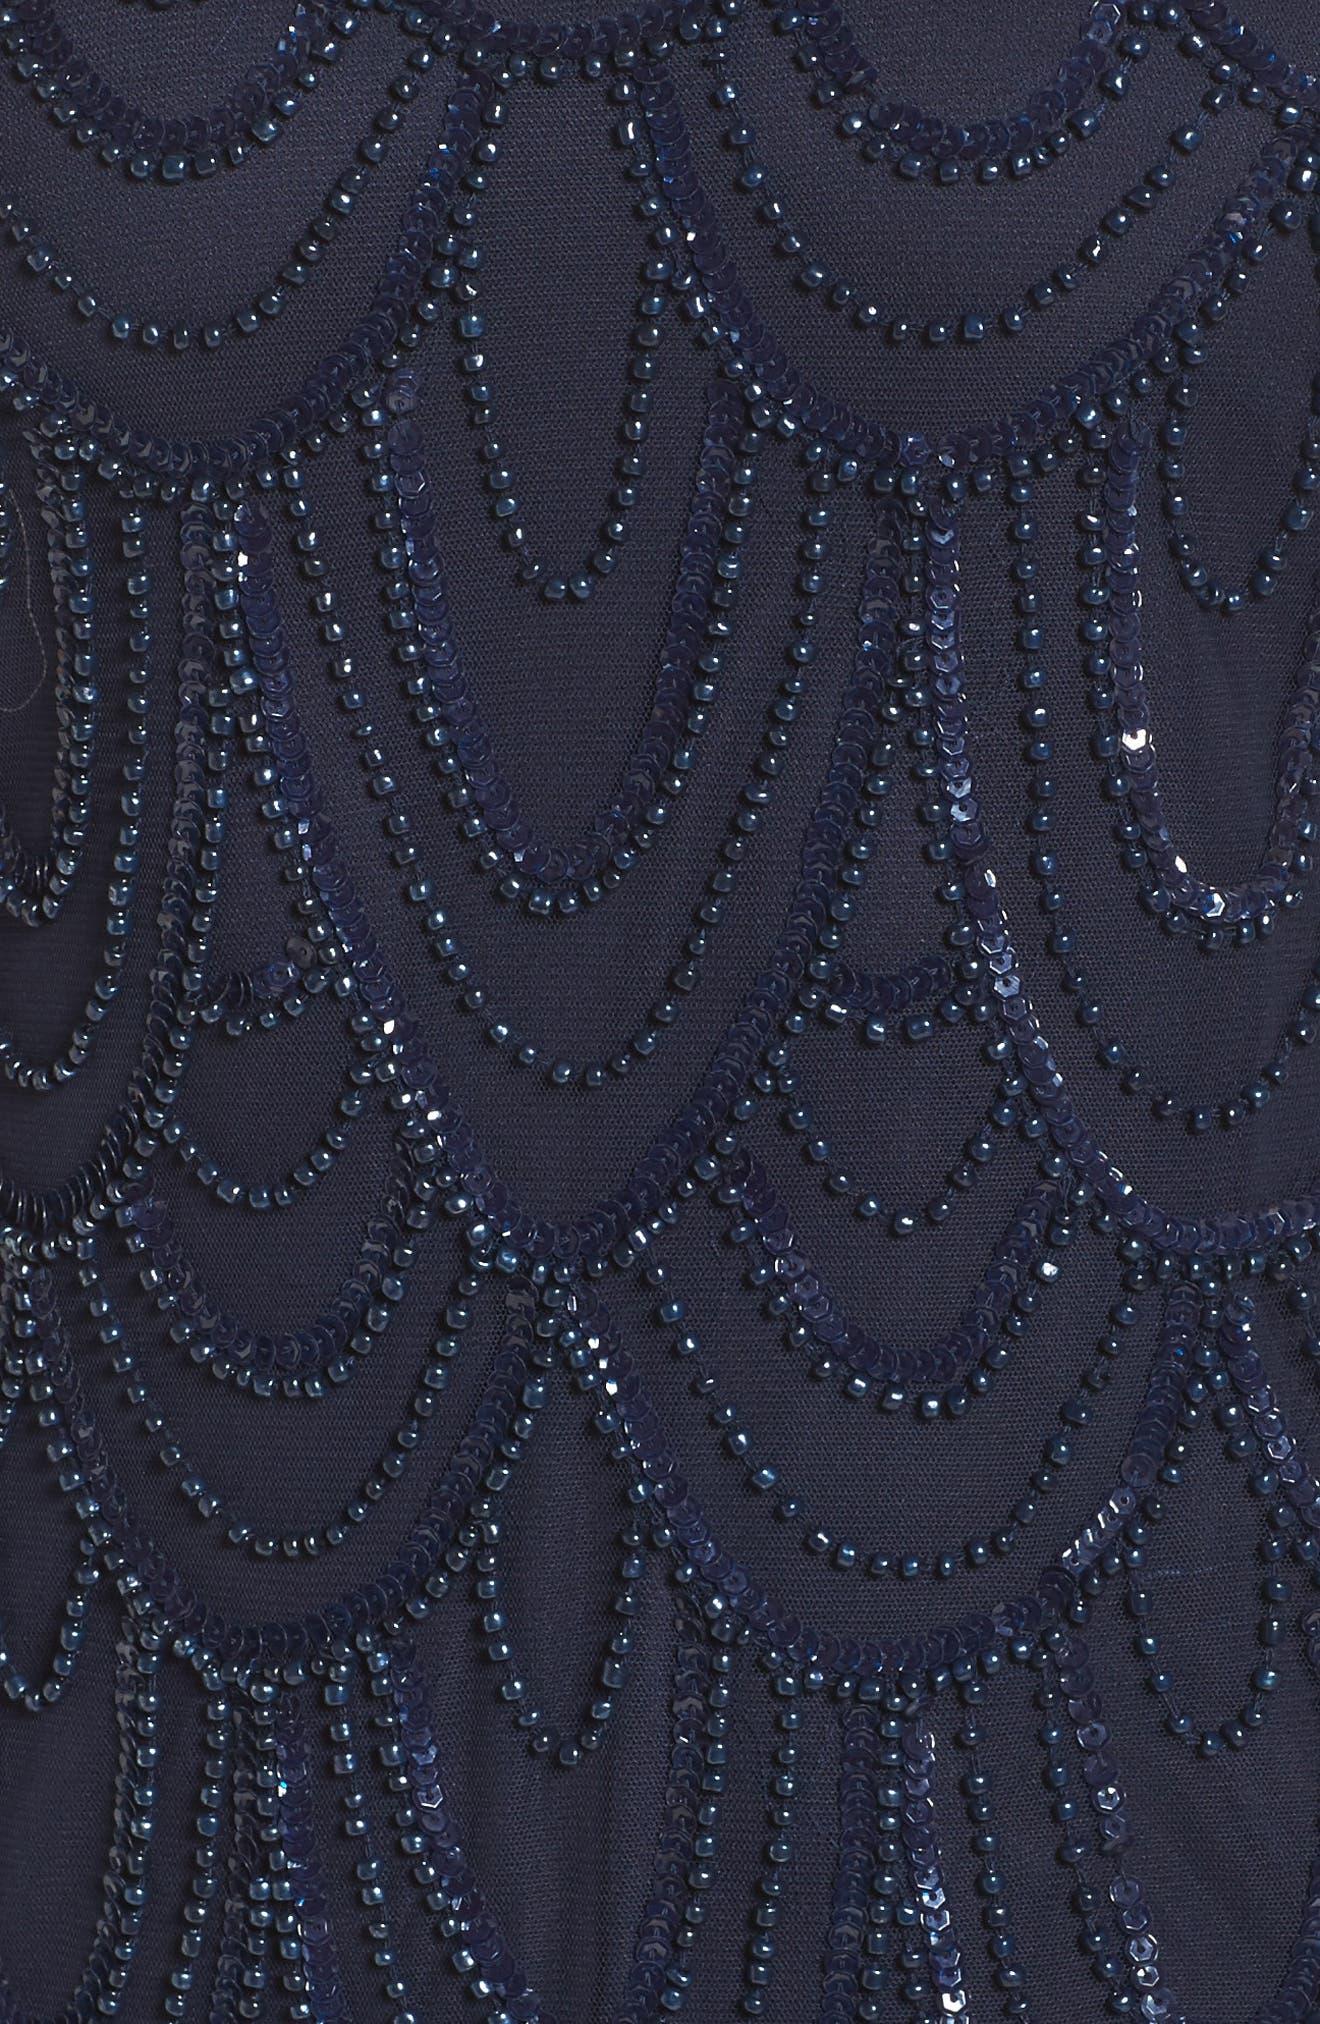 Embellished Mesh Sheath Dress,                             Alternate thumbnail 79, color,